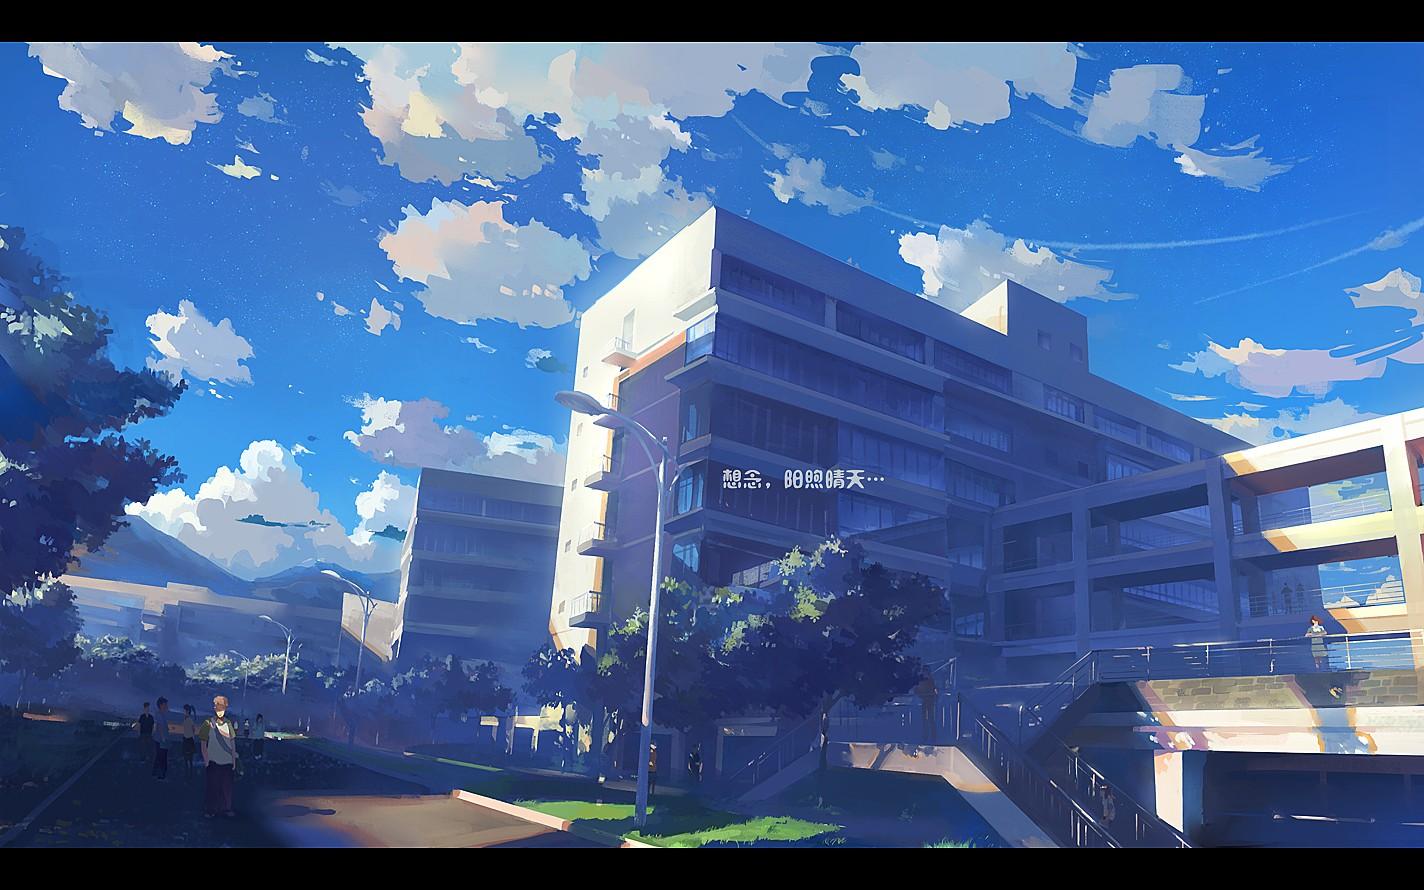 digital scenery wallpaper